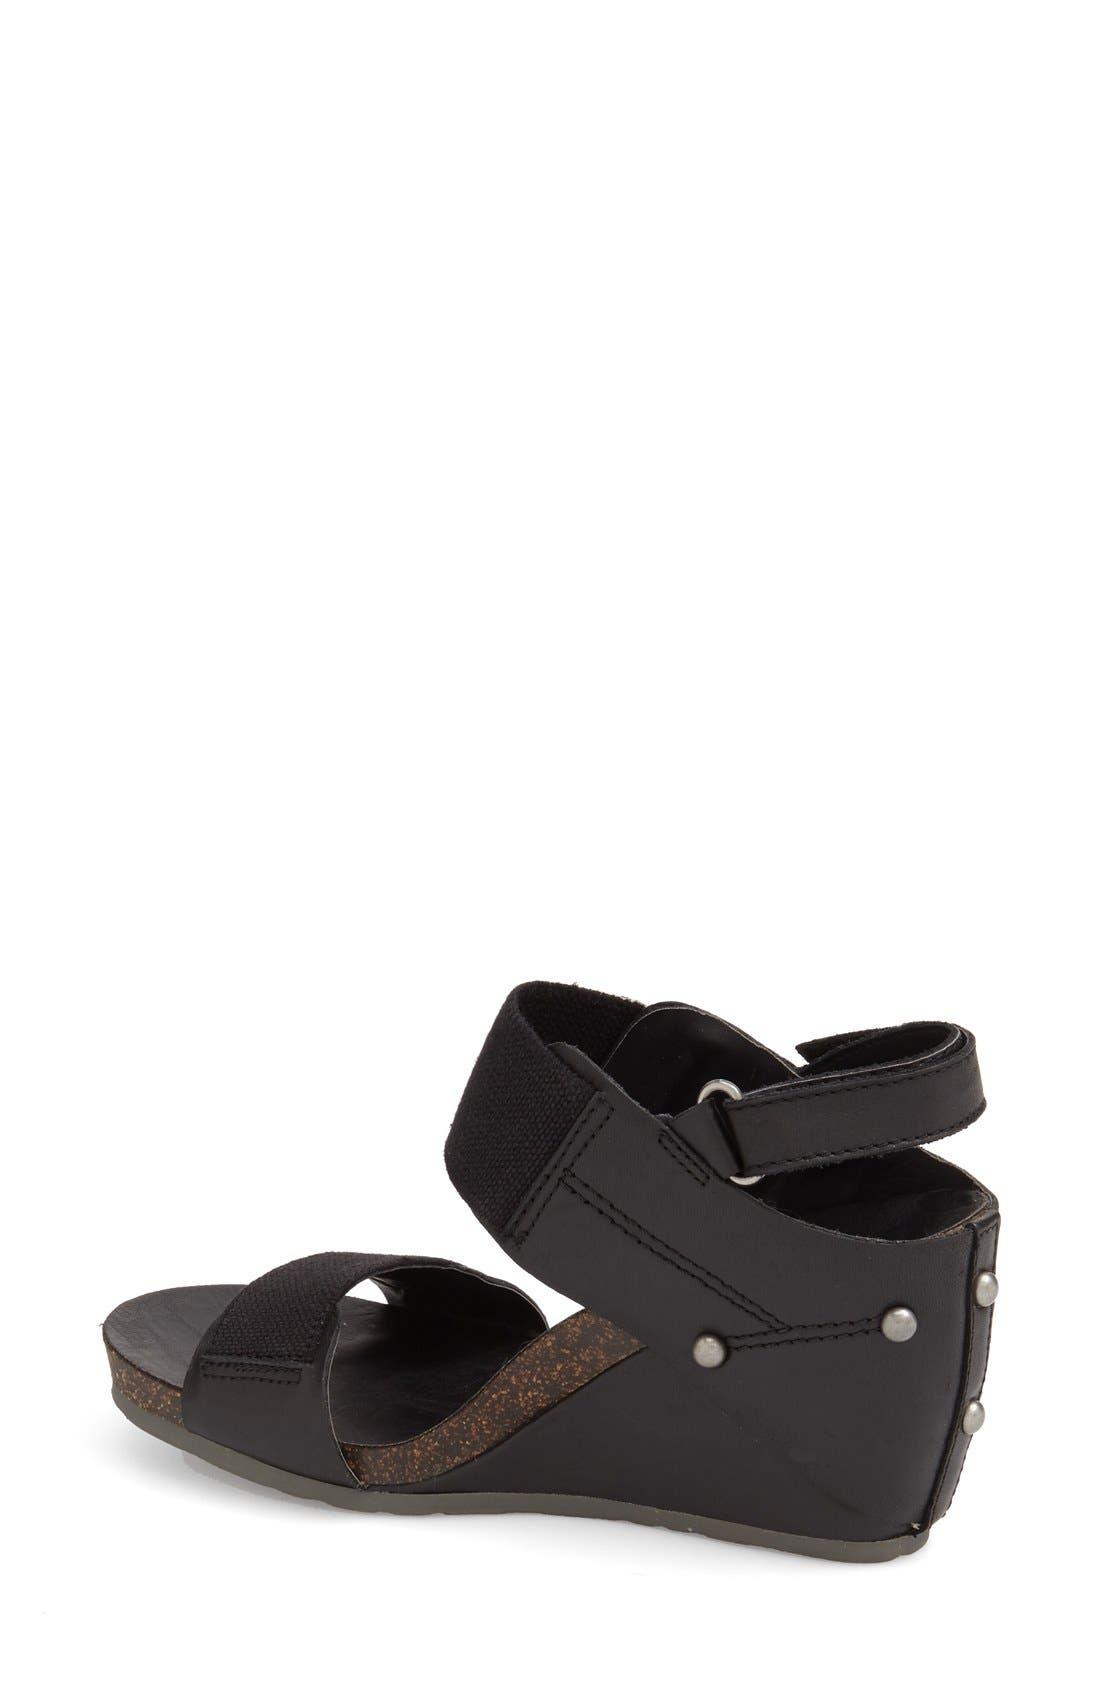 'Trailblazer' Wedge Sandal,                             Alternate thumbnail 2, color,                             Black Leather